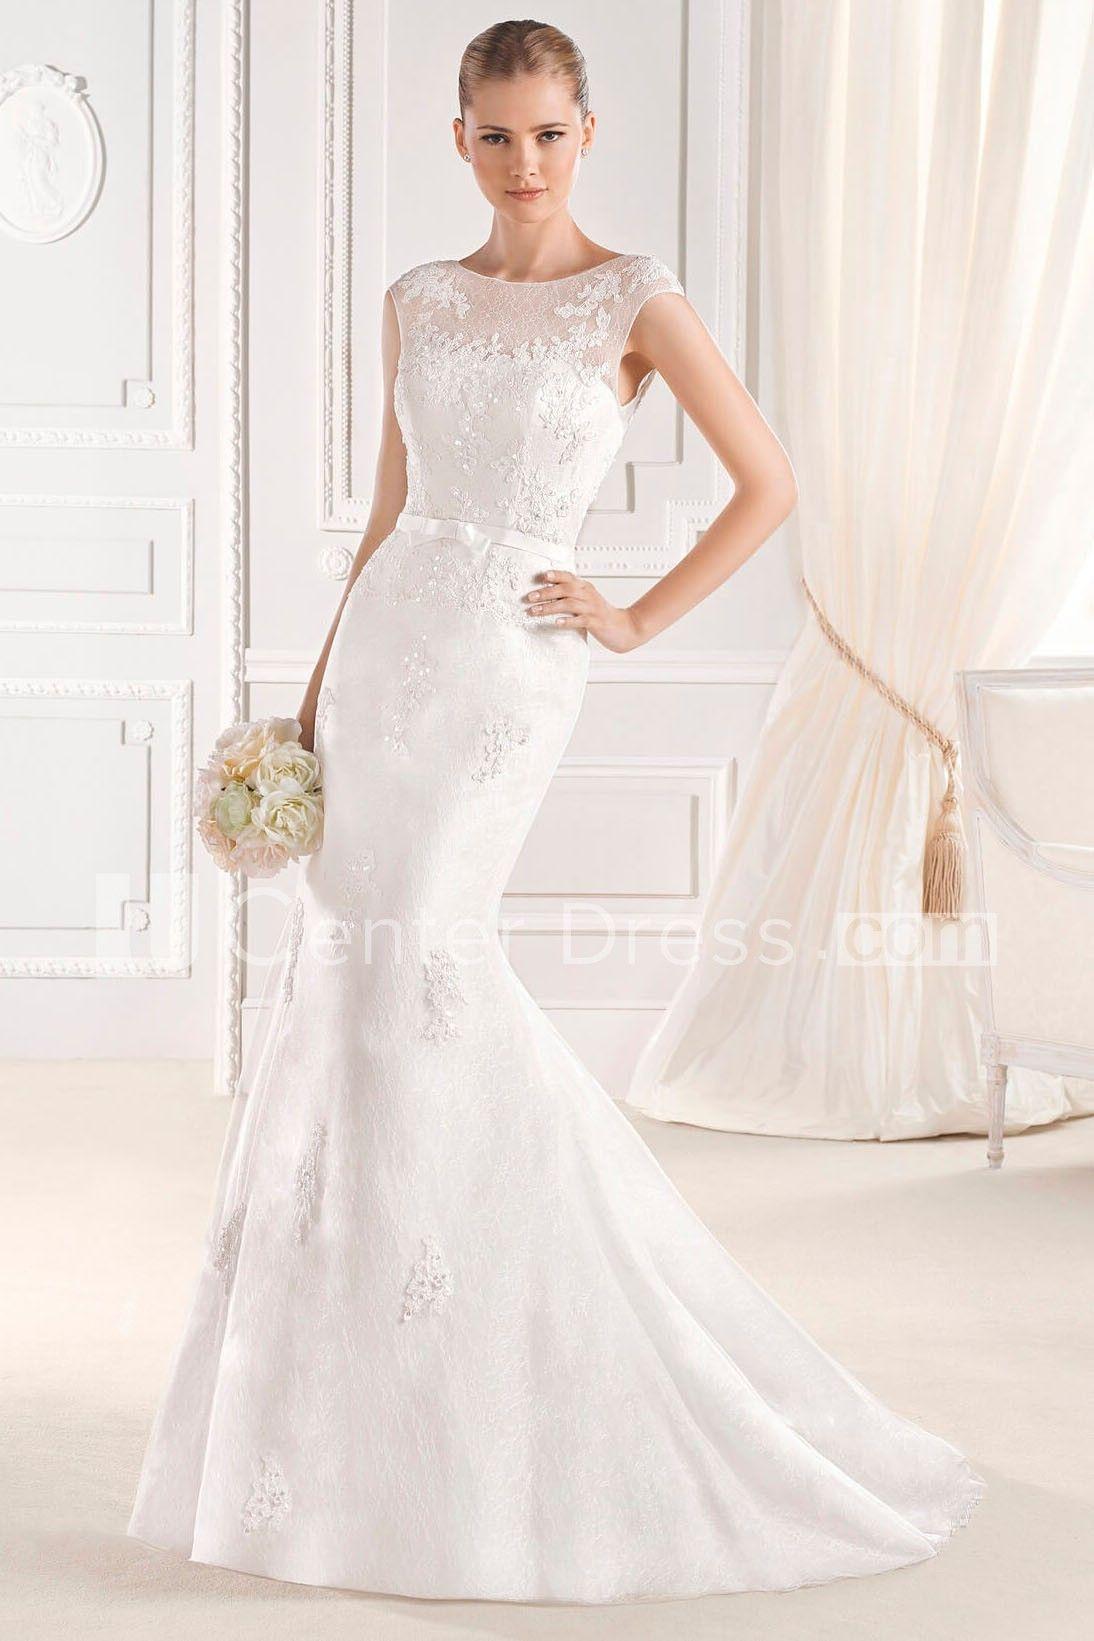 Mermaid dress wedding  Elegant u Classic Trumpet CapSleeve ScoopNeck Long Mermaid